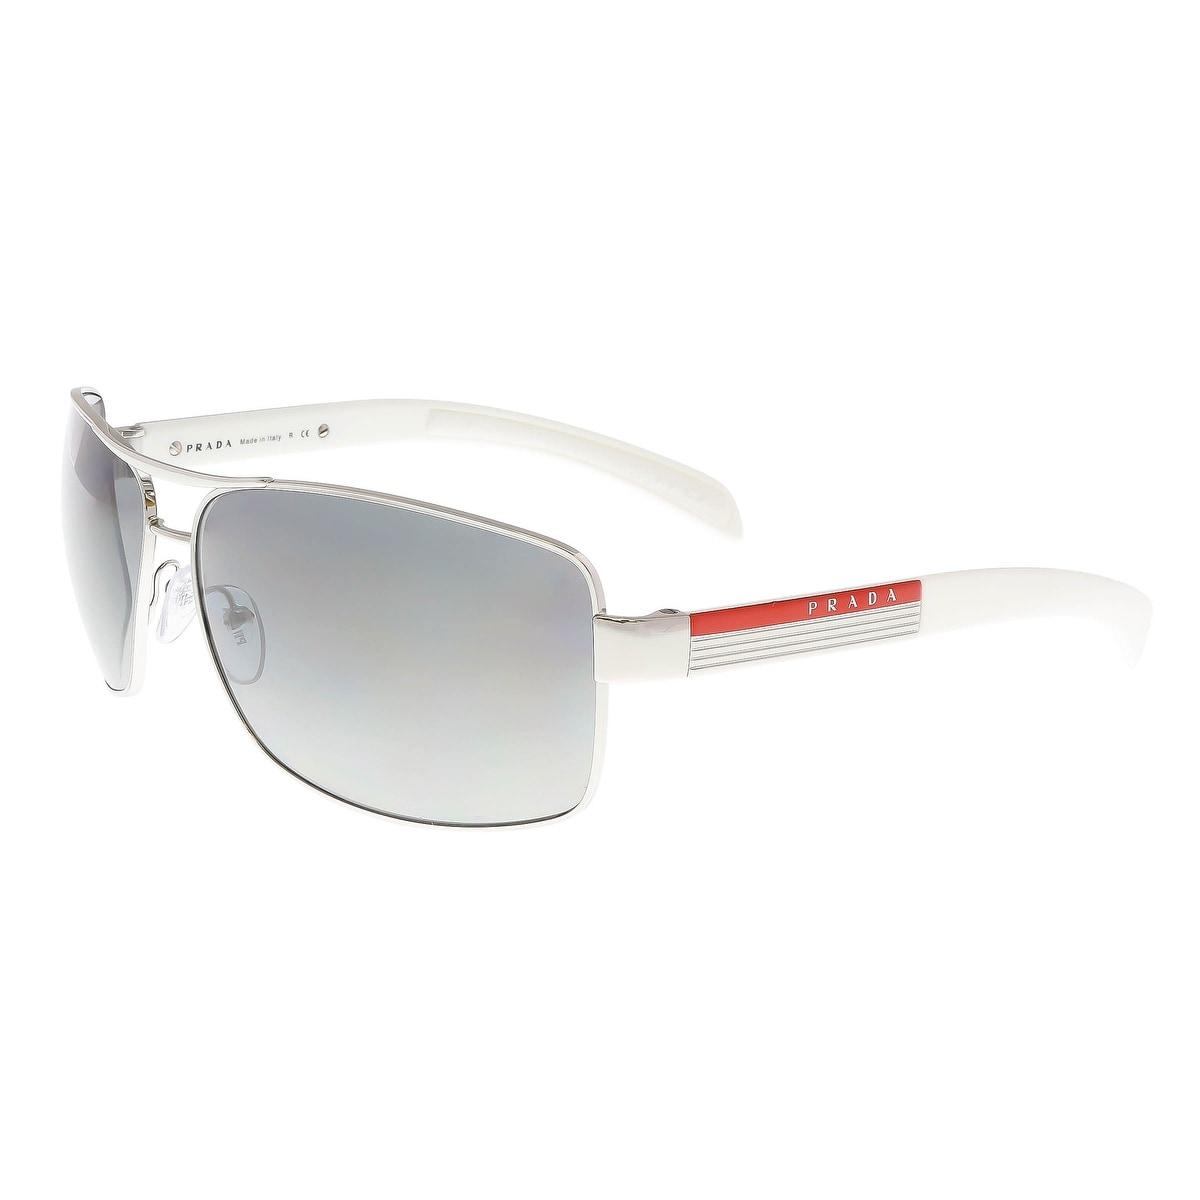 22cc5d6689 Prada Linea Rossa PS 54IS 1BC3M1 Silver Rectangle Sunglasses - 65-14-125